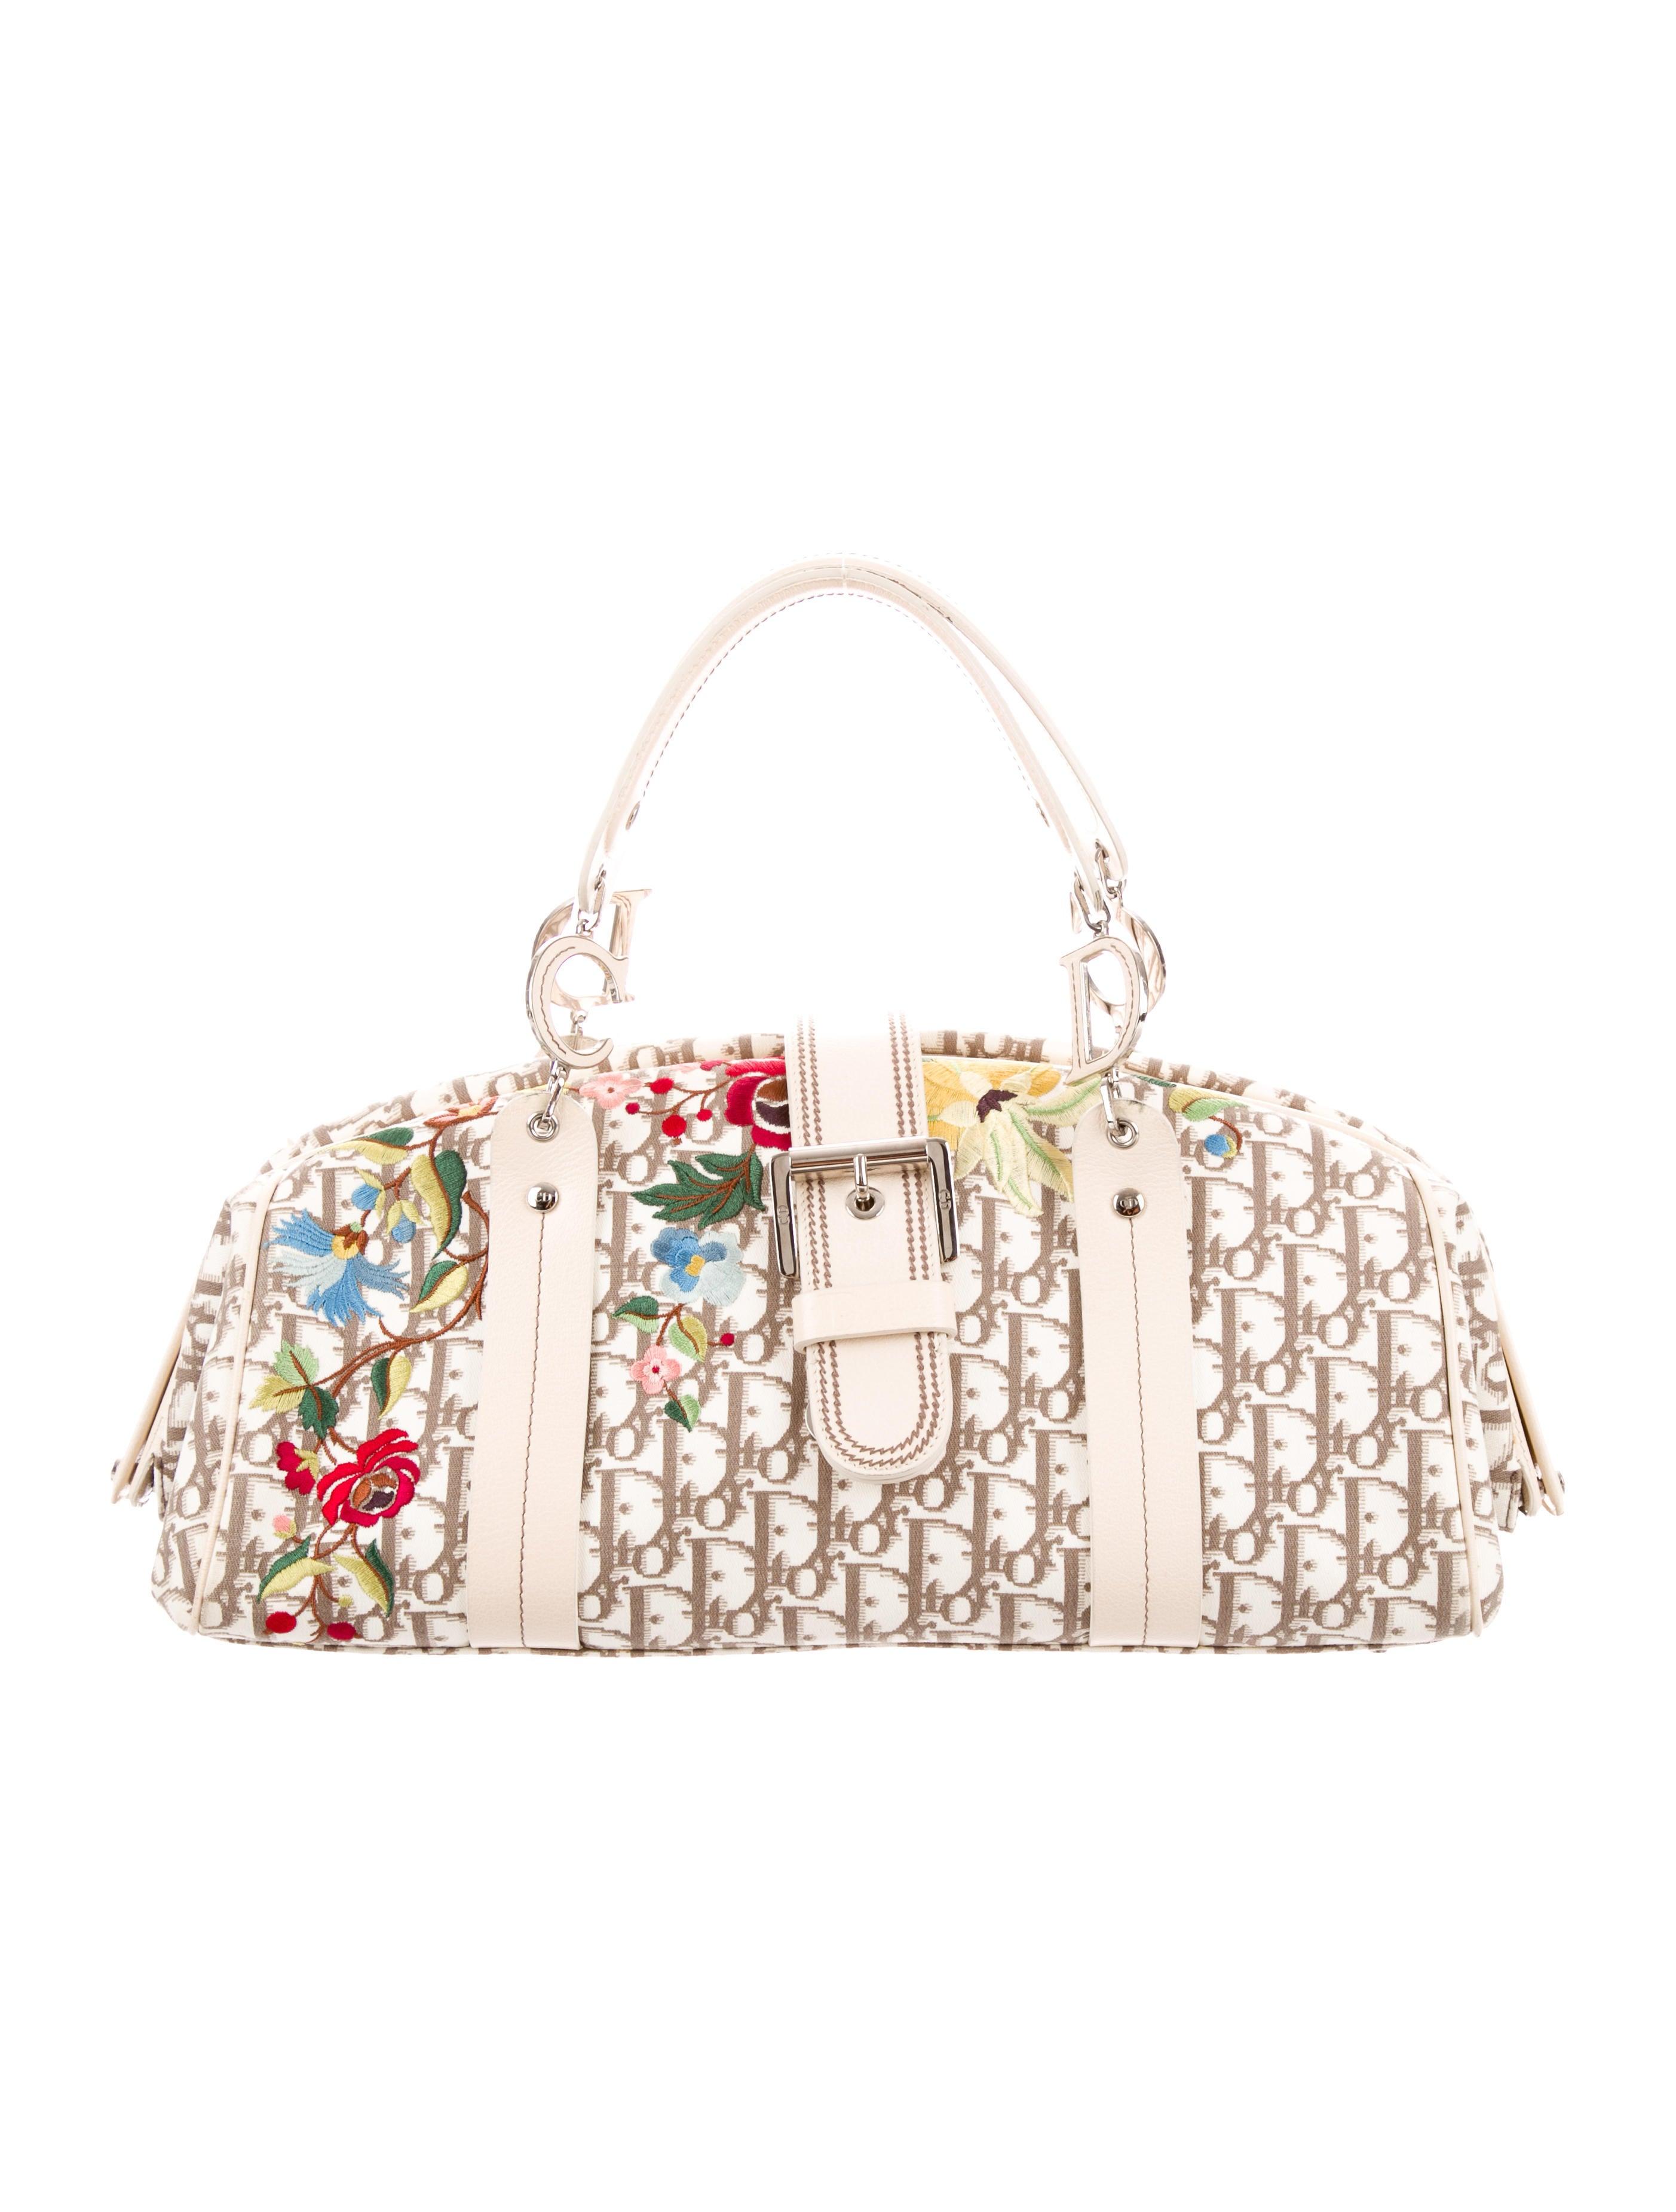 Embroidered Diorissimo Handle Bag by Christian Dior